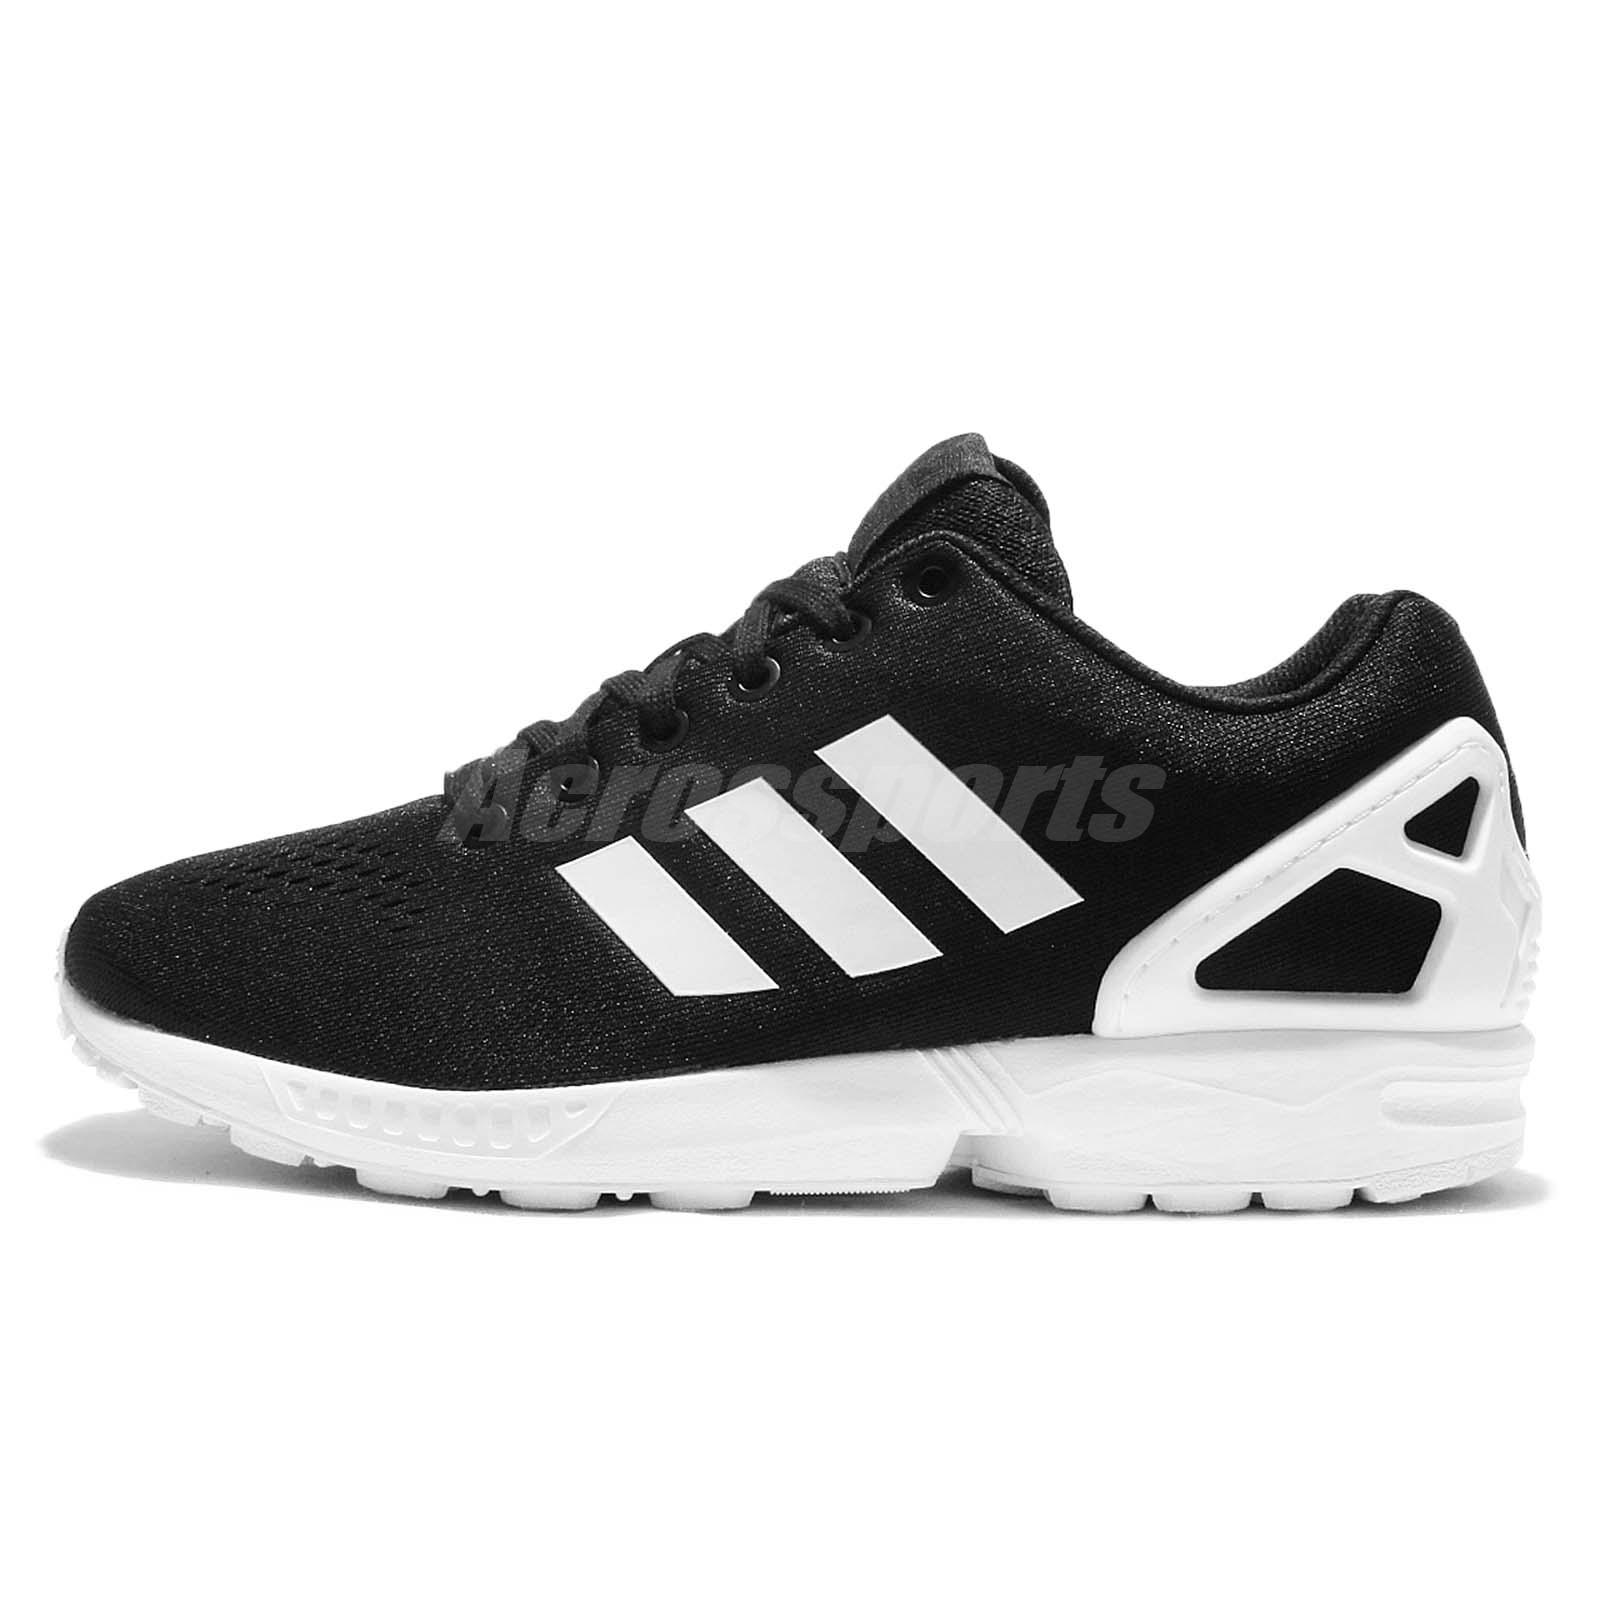 best sneakers 4615e a724e ... adidas Originals ZX Flux EM Black White Mens Casual Shoes Sneakers  S76499 .